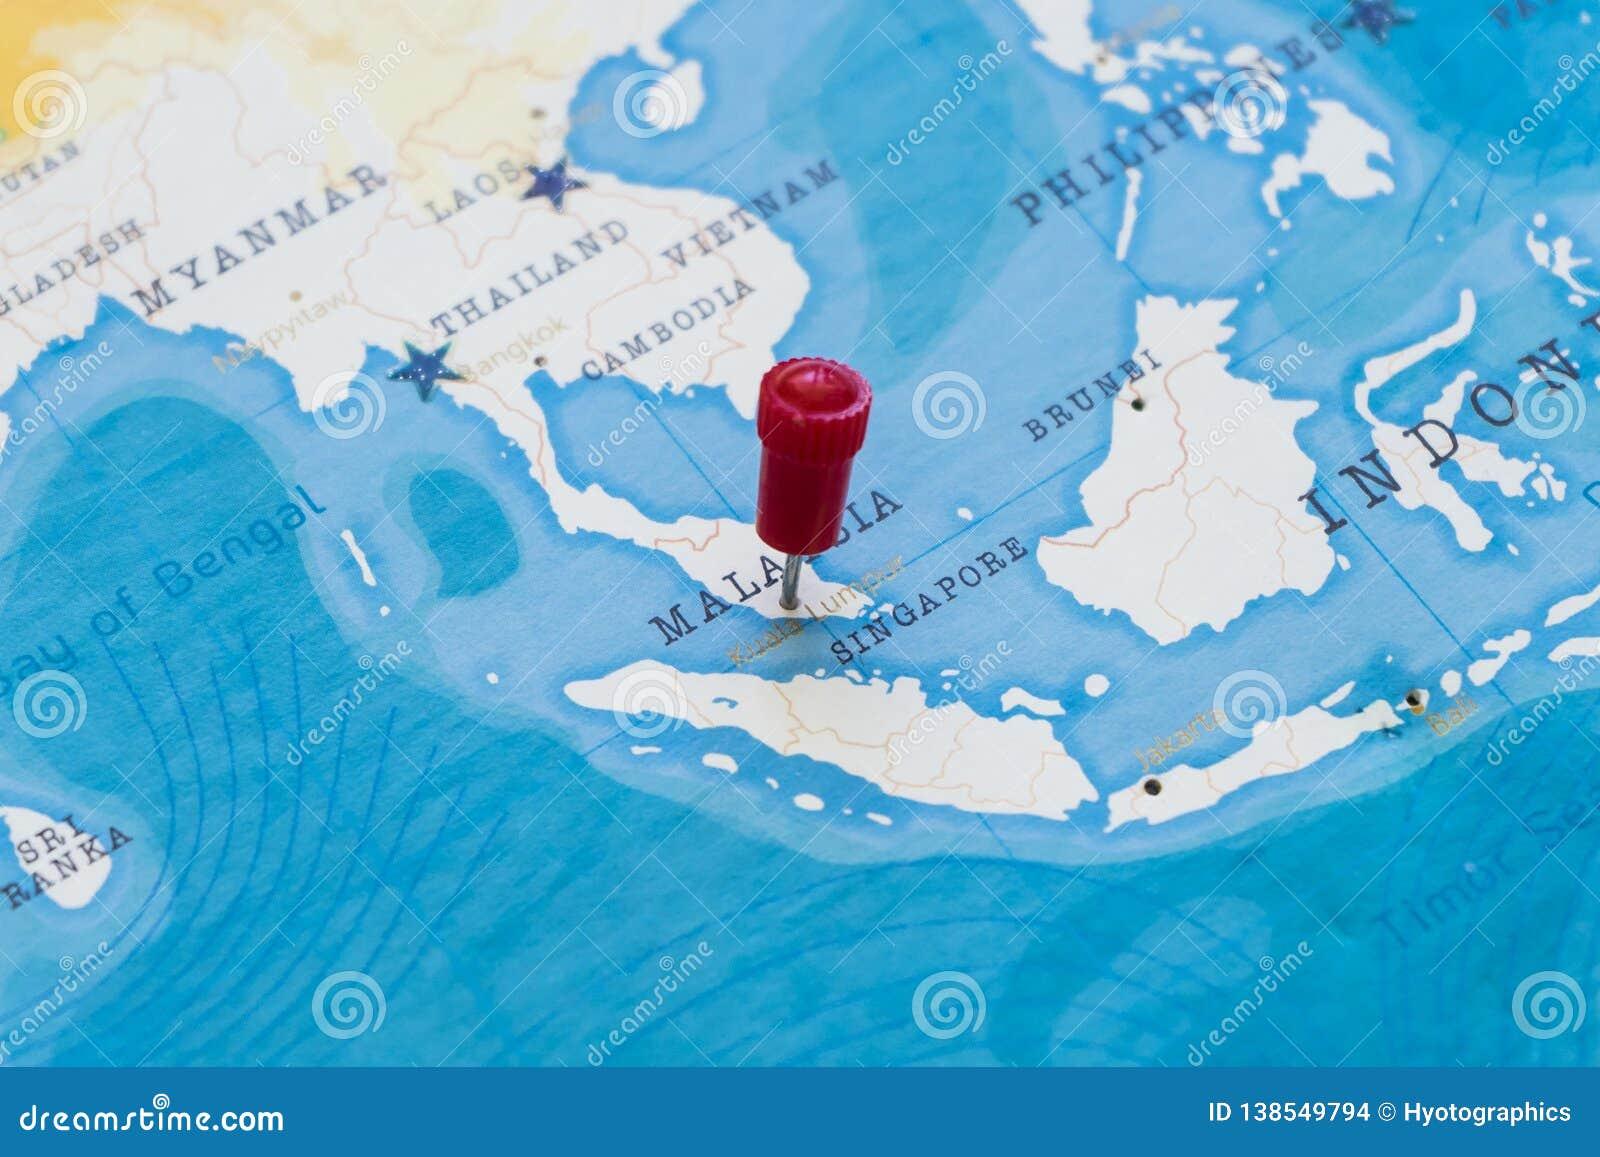 Malaysia On The World Map.A Pin On Kuala Lumpur Malaysia In The World Map Stock Photo Image